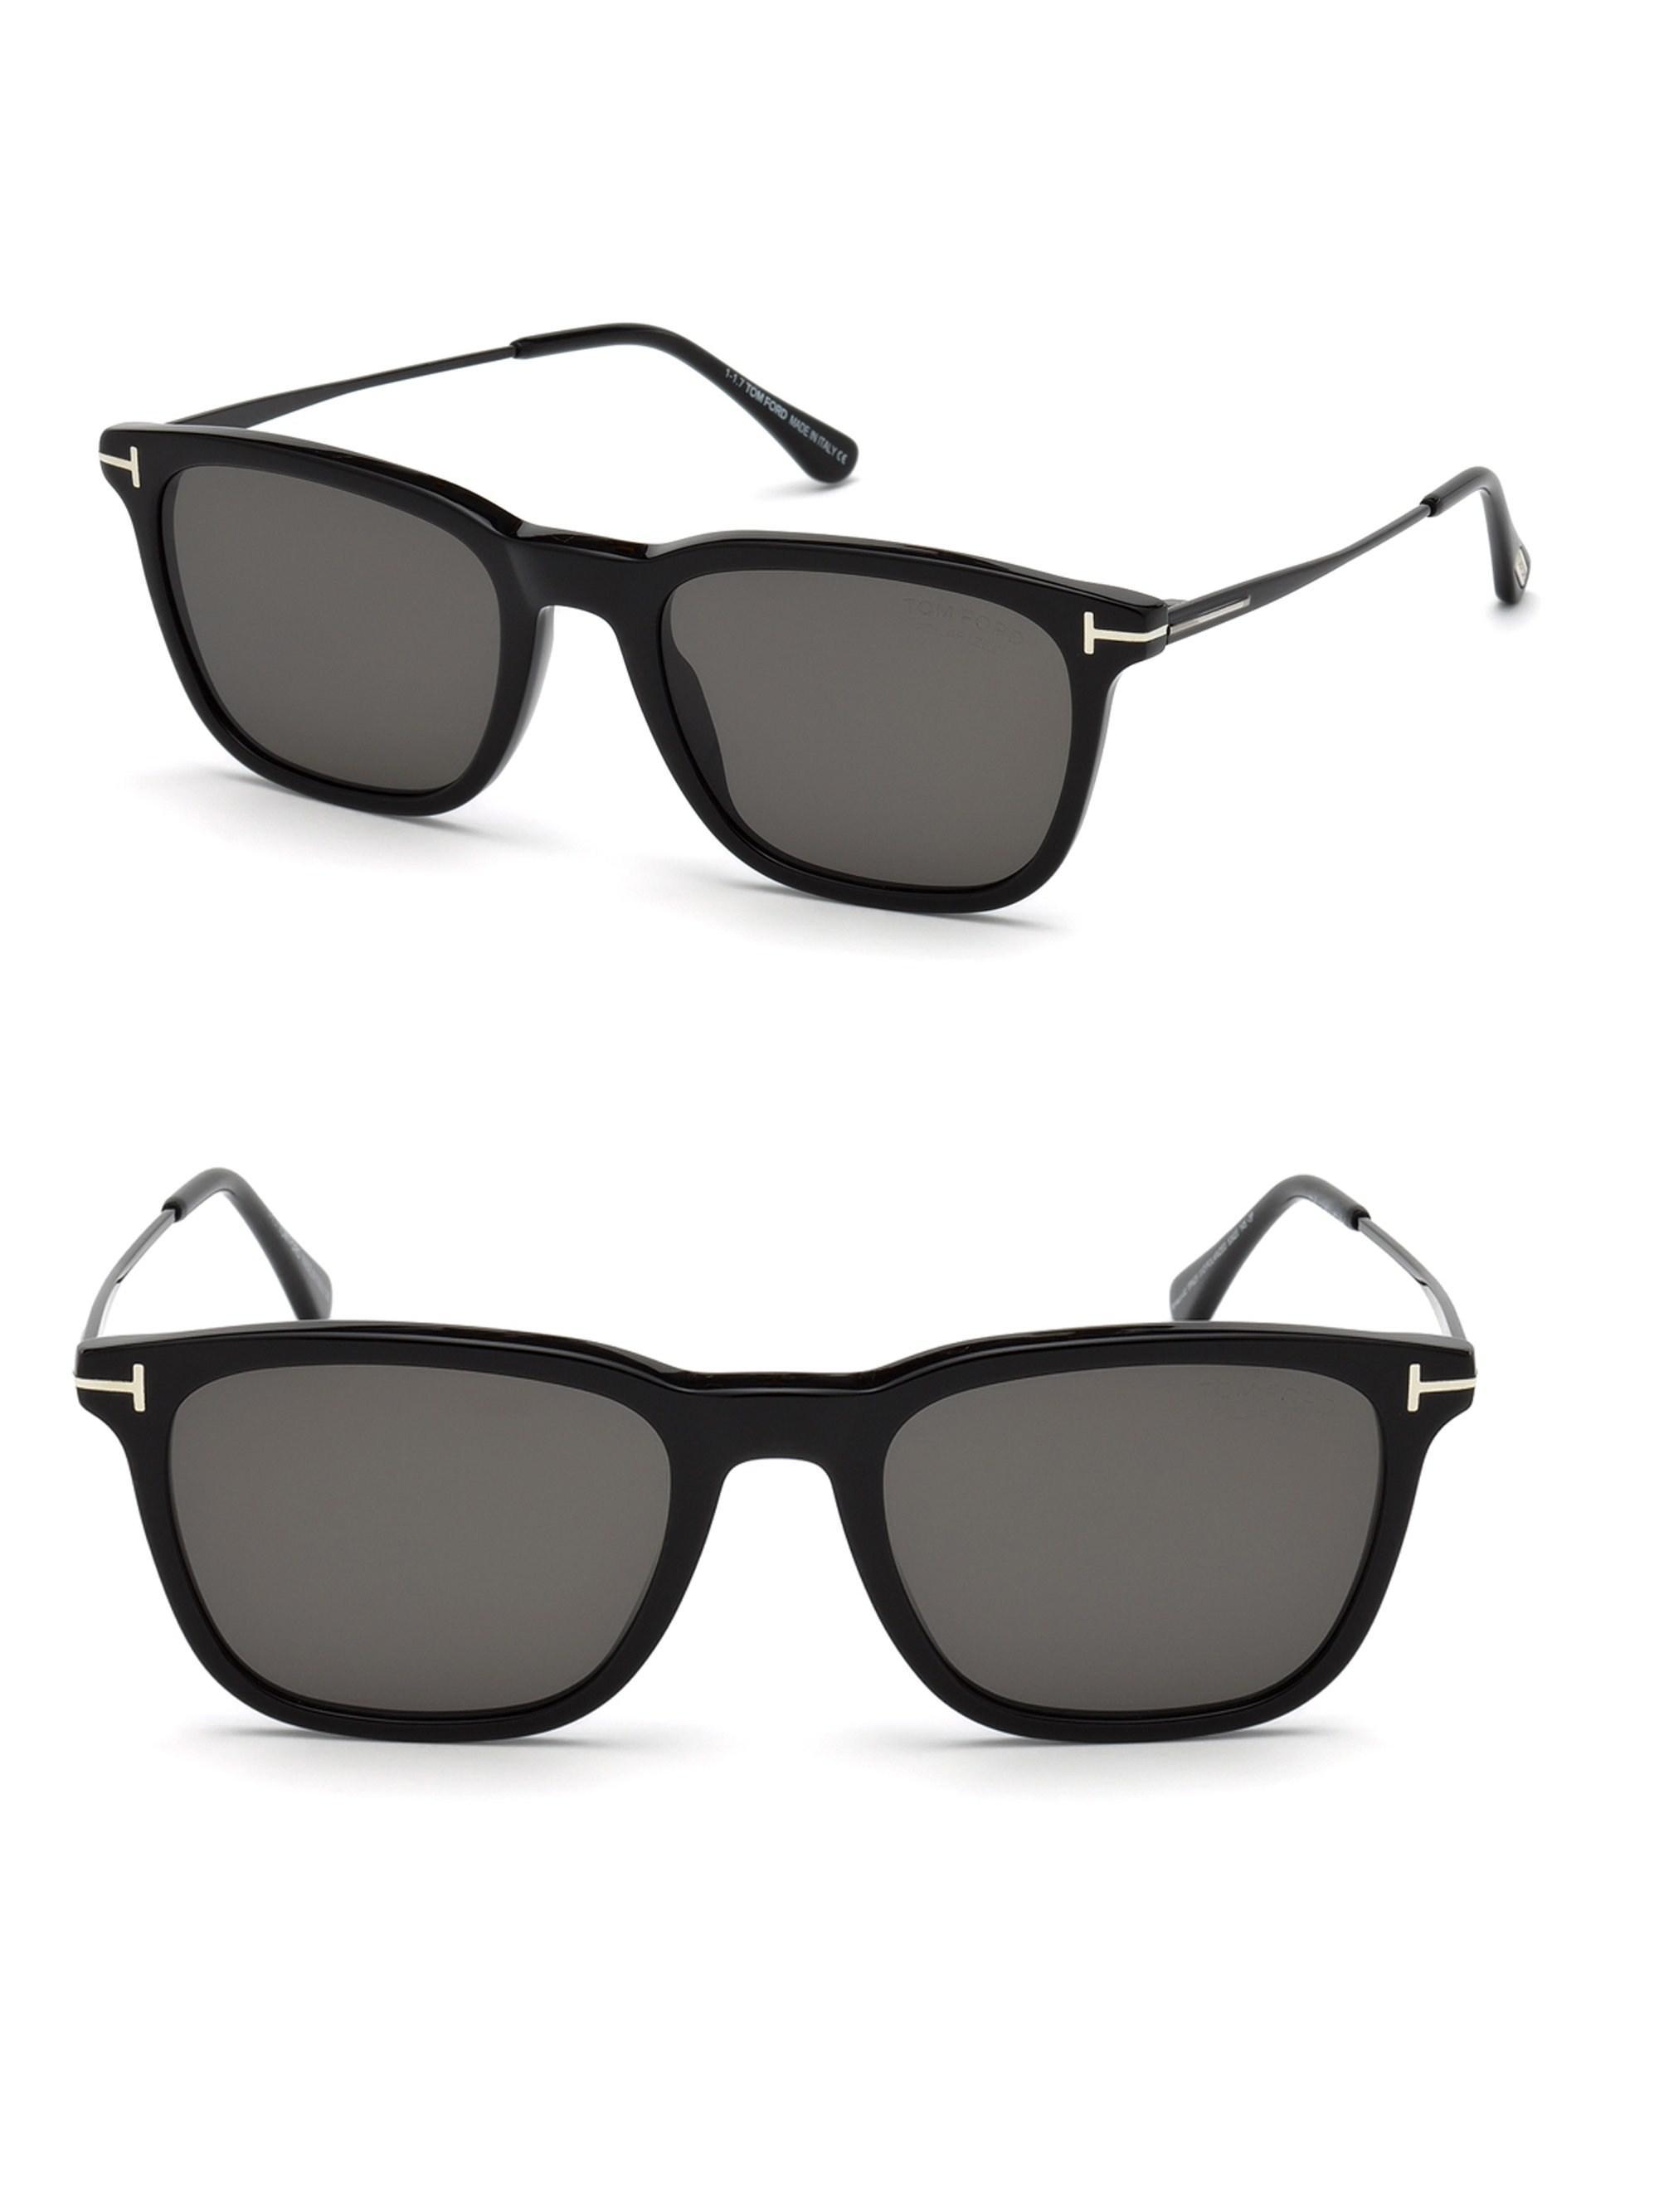 9ad03320f10 Tom Ford - Black 53mm Geometric Square Sunglasses for Men - Lyst. View  fullscreen